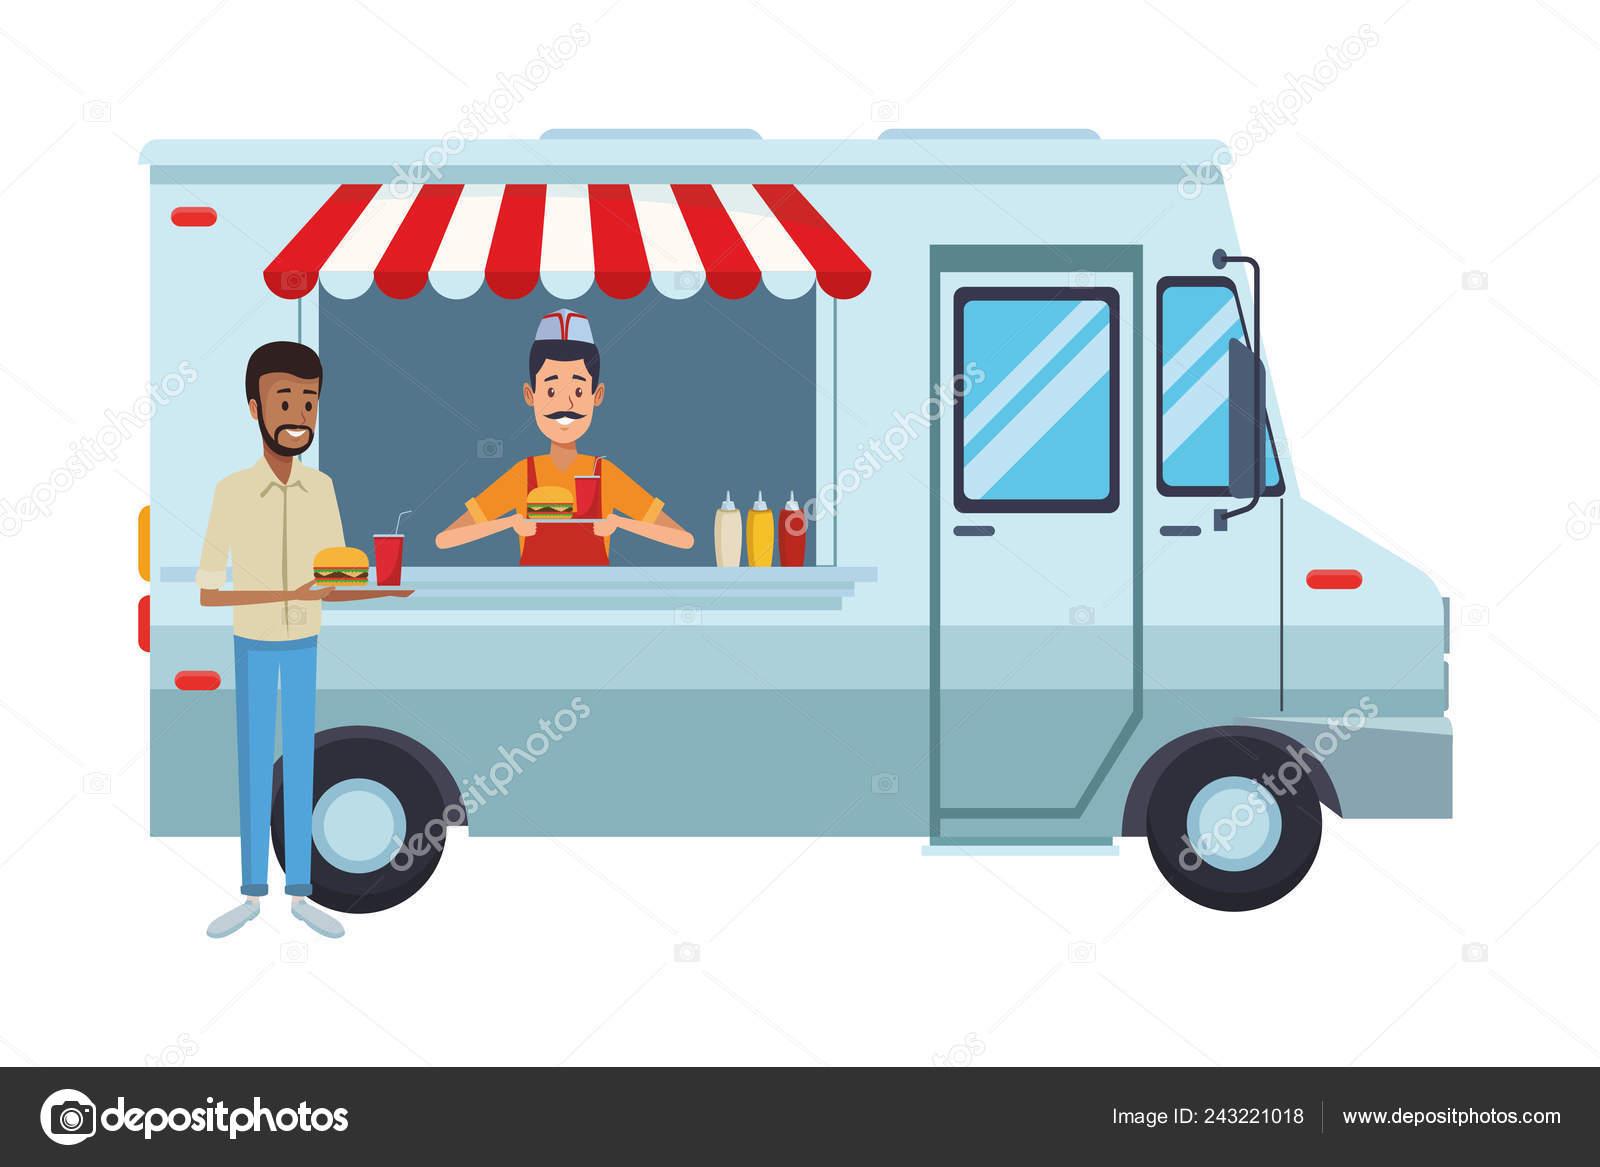 Fast Food Truck Cartoon Stock Vector C Jemastock 243221018